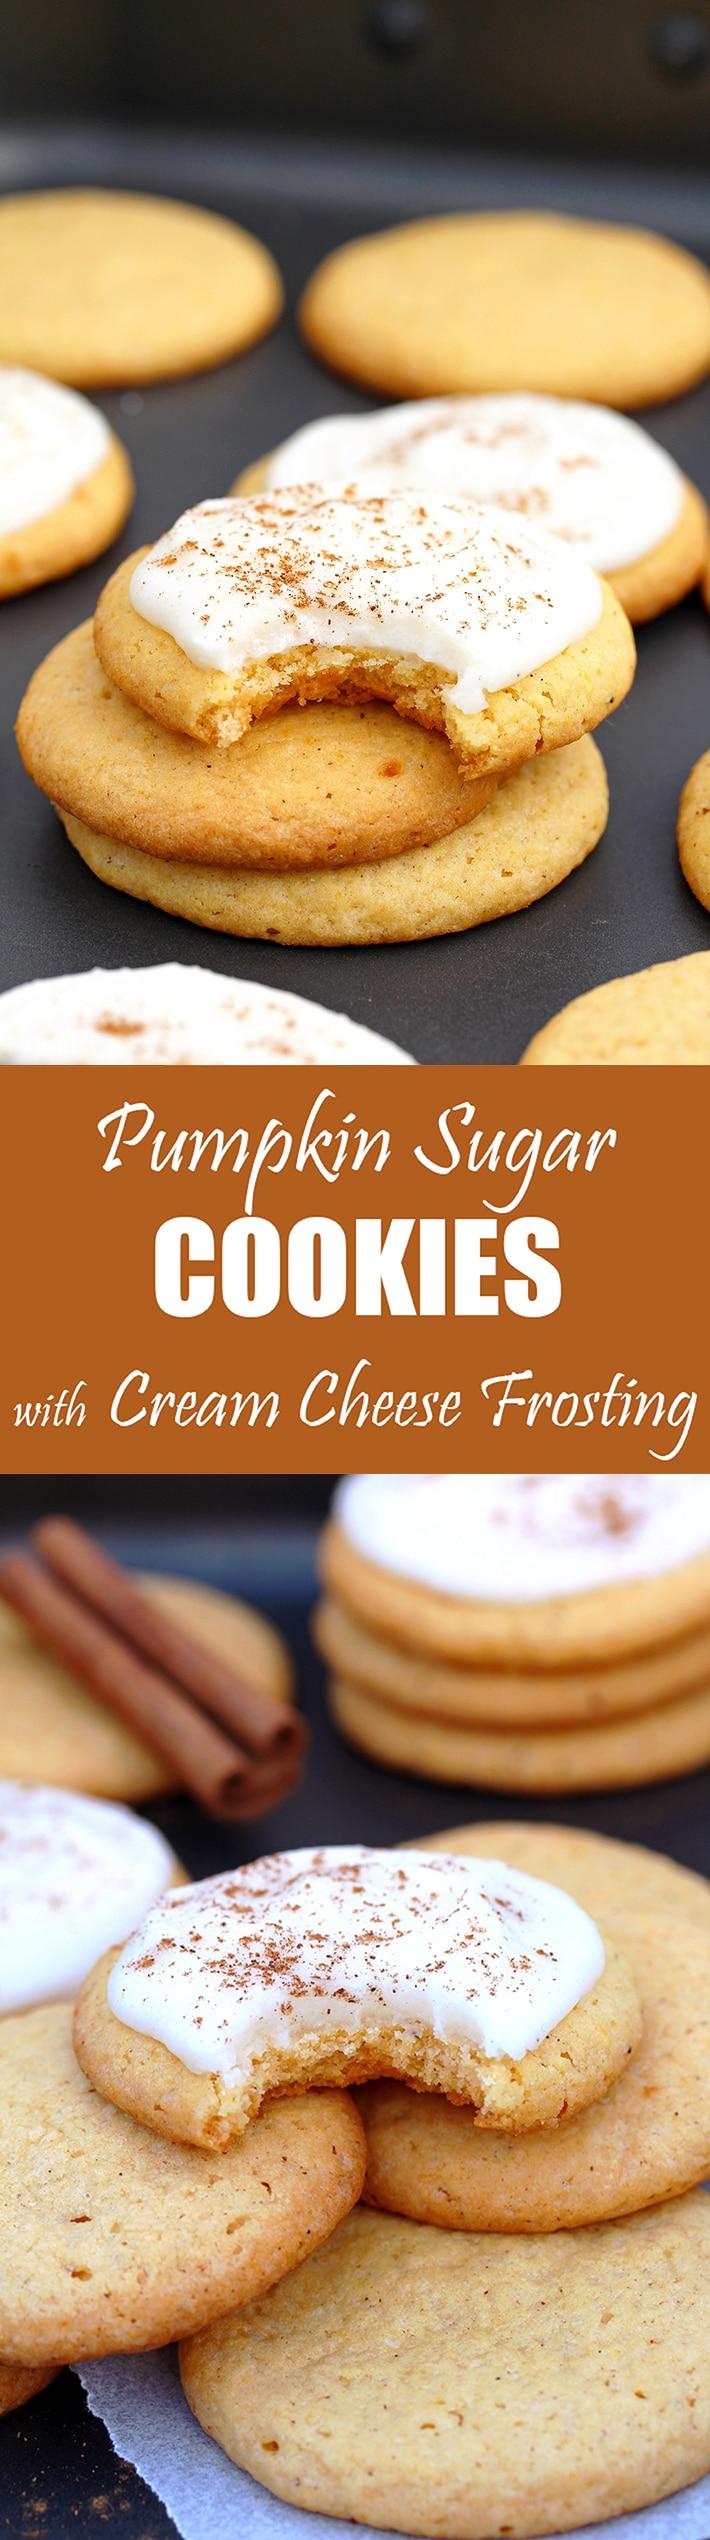 Pumpkin Sugar Cookies with Cream Cheese Frosting  – these crunchy sugar cookies with pumpkin and cream cheese frosting are perfect for fall and upcoming holidays